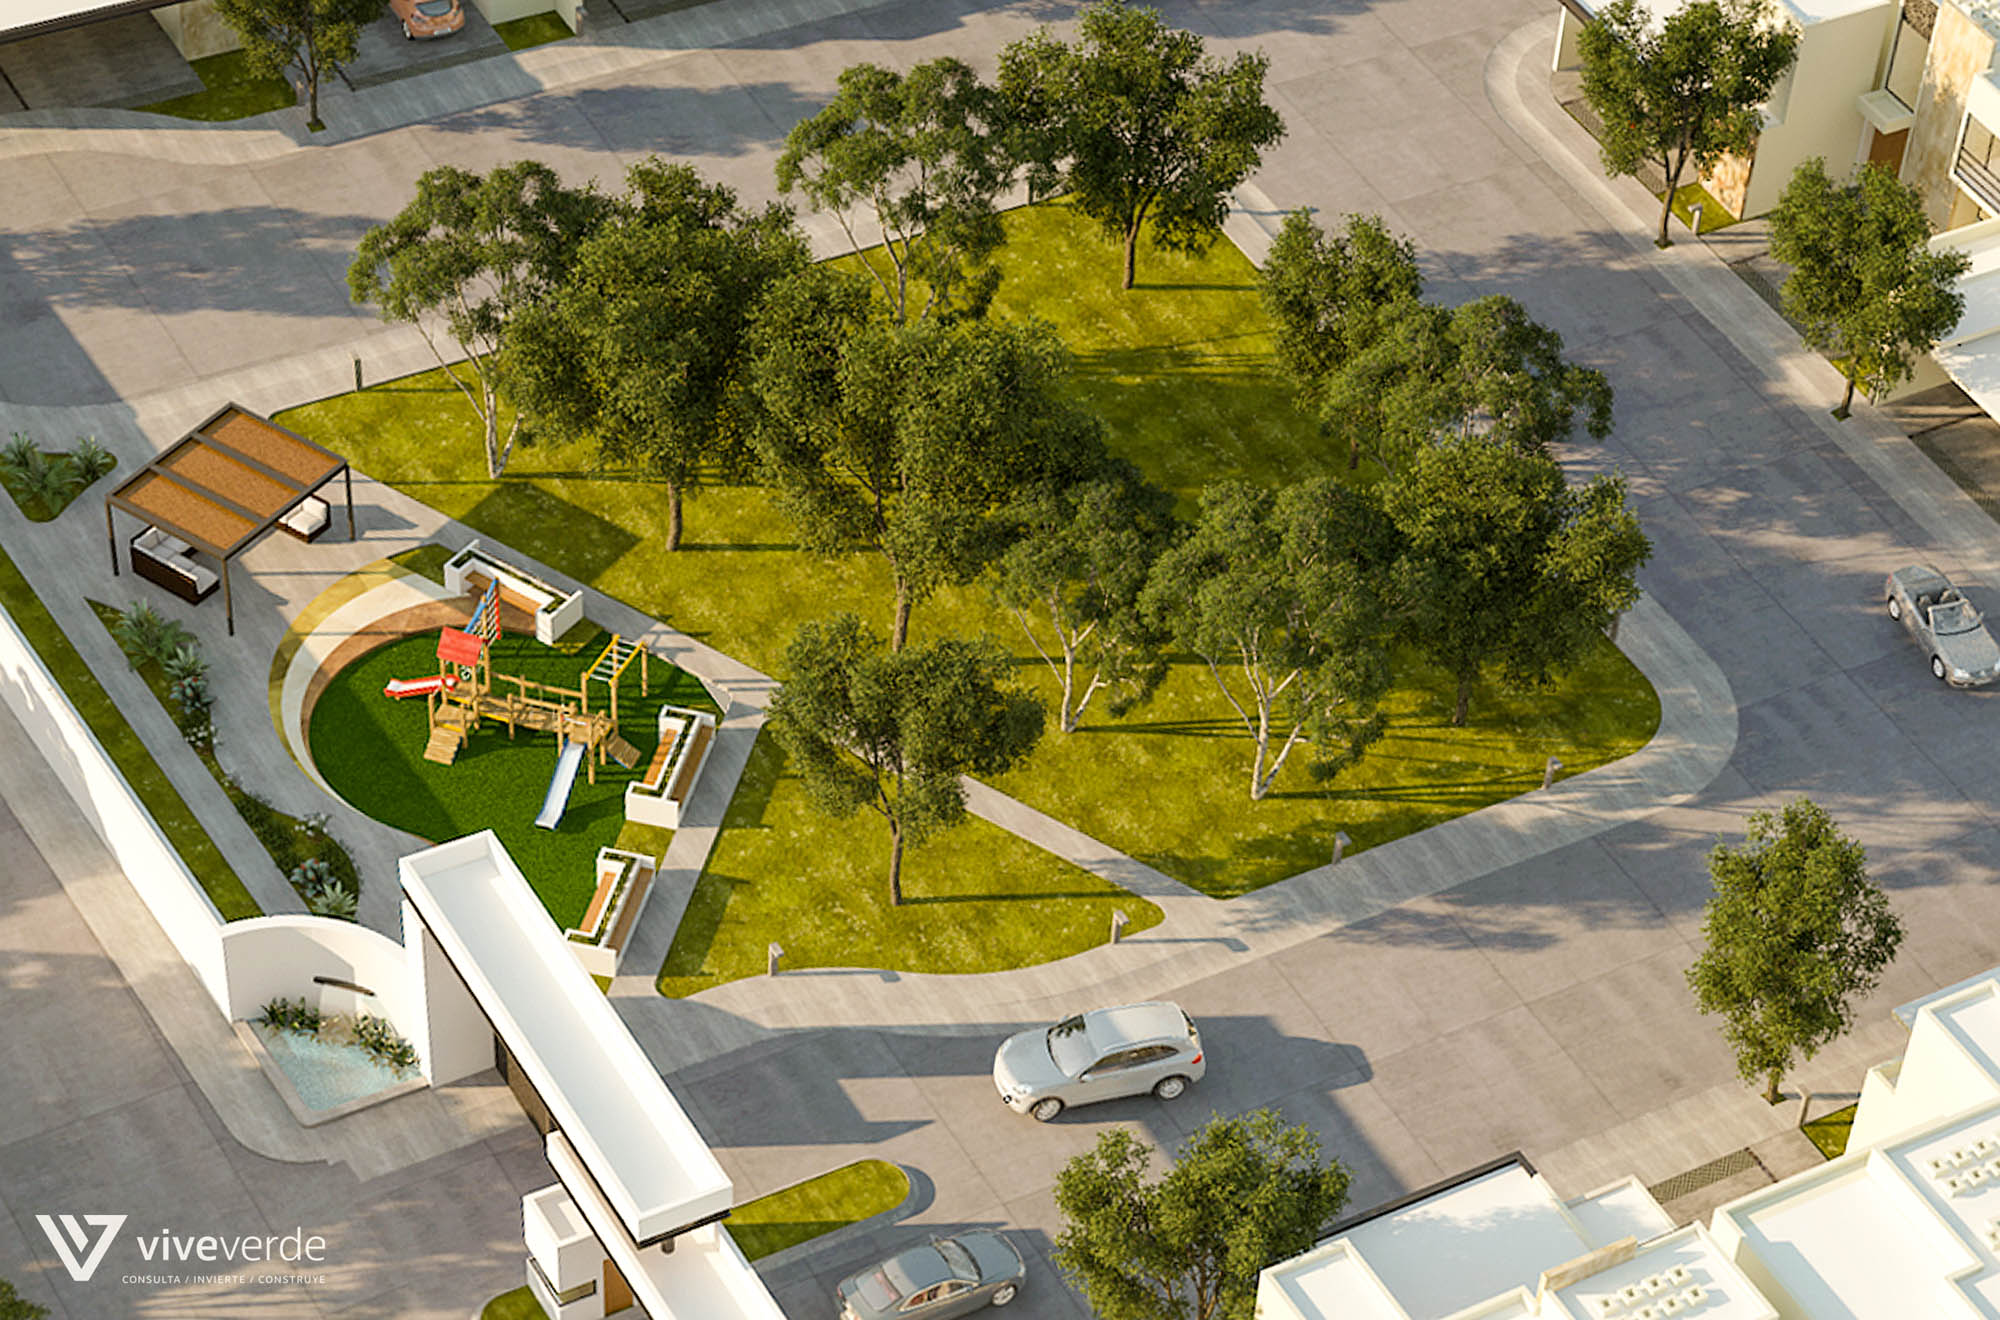 1,250 m2 áreas verdes con calles de concreto